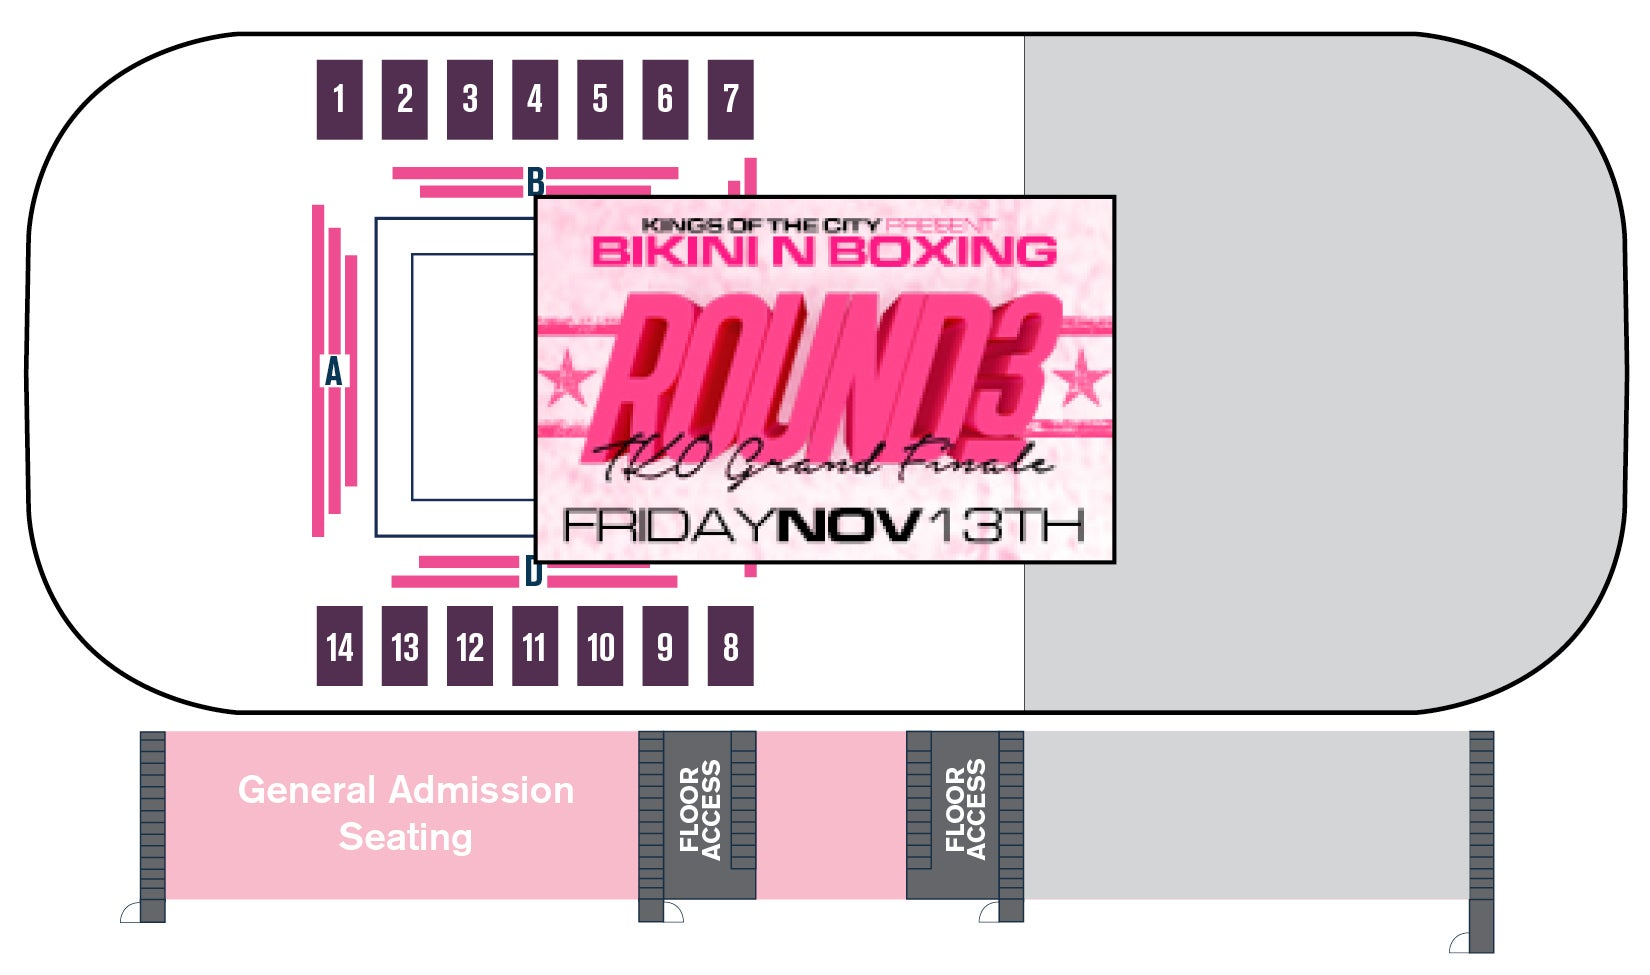 Bikini N Boxing Seating chart